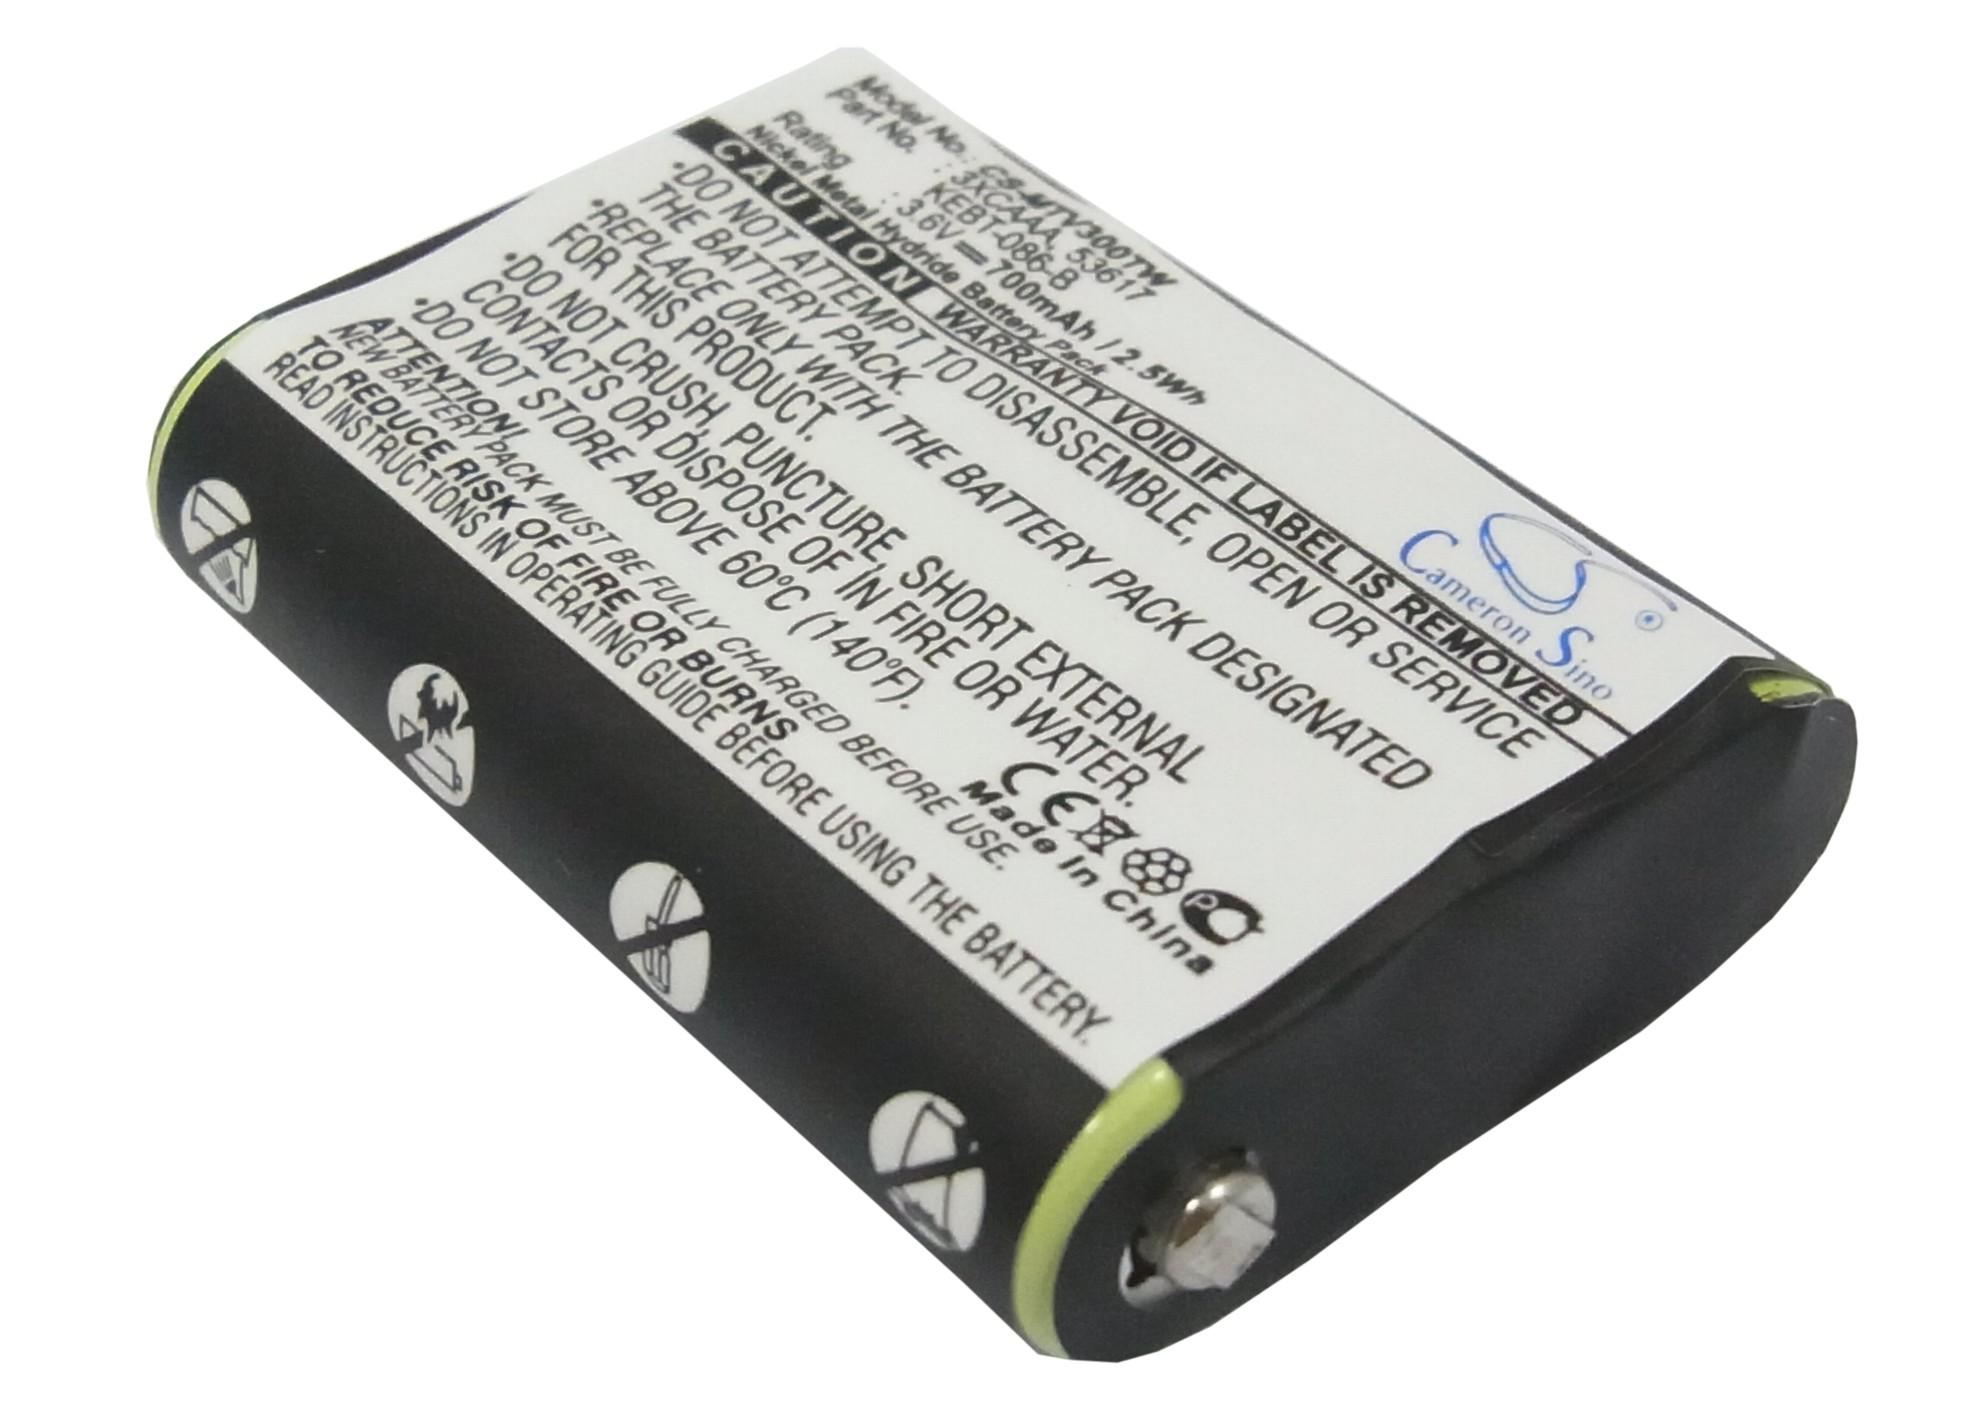 Cameron Sino baterie do vysílaček pro MOTOROLA SX600 3.6V Ni-MH 700mAh černá - neoriginální